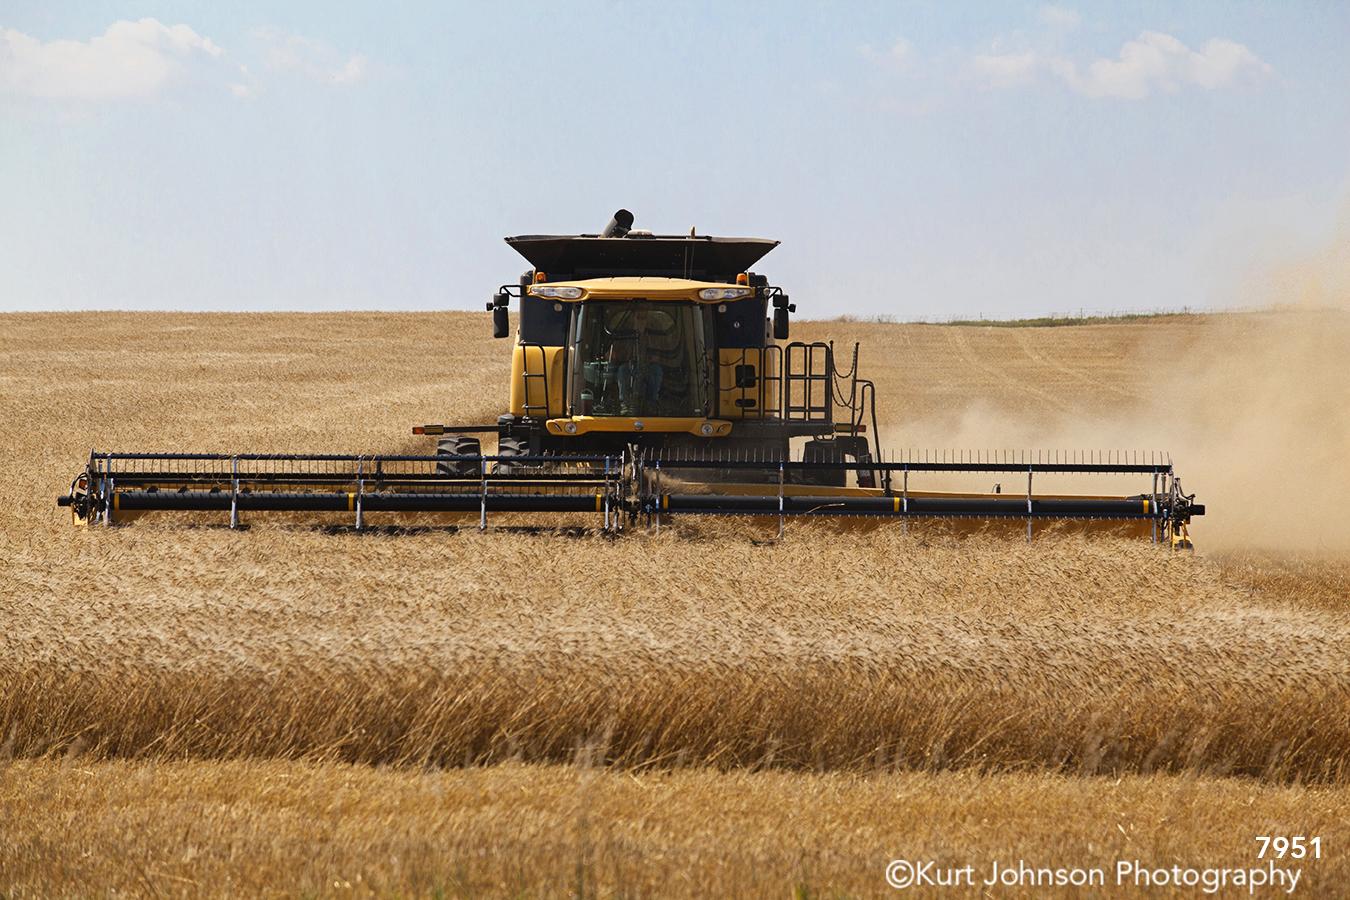 midwest farm tractor field tall grass grasses wheat blue sky